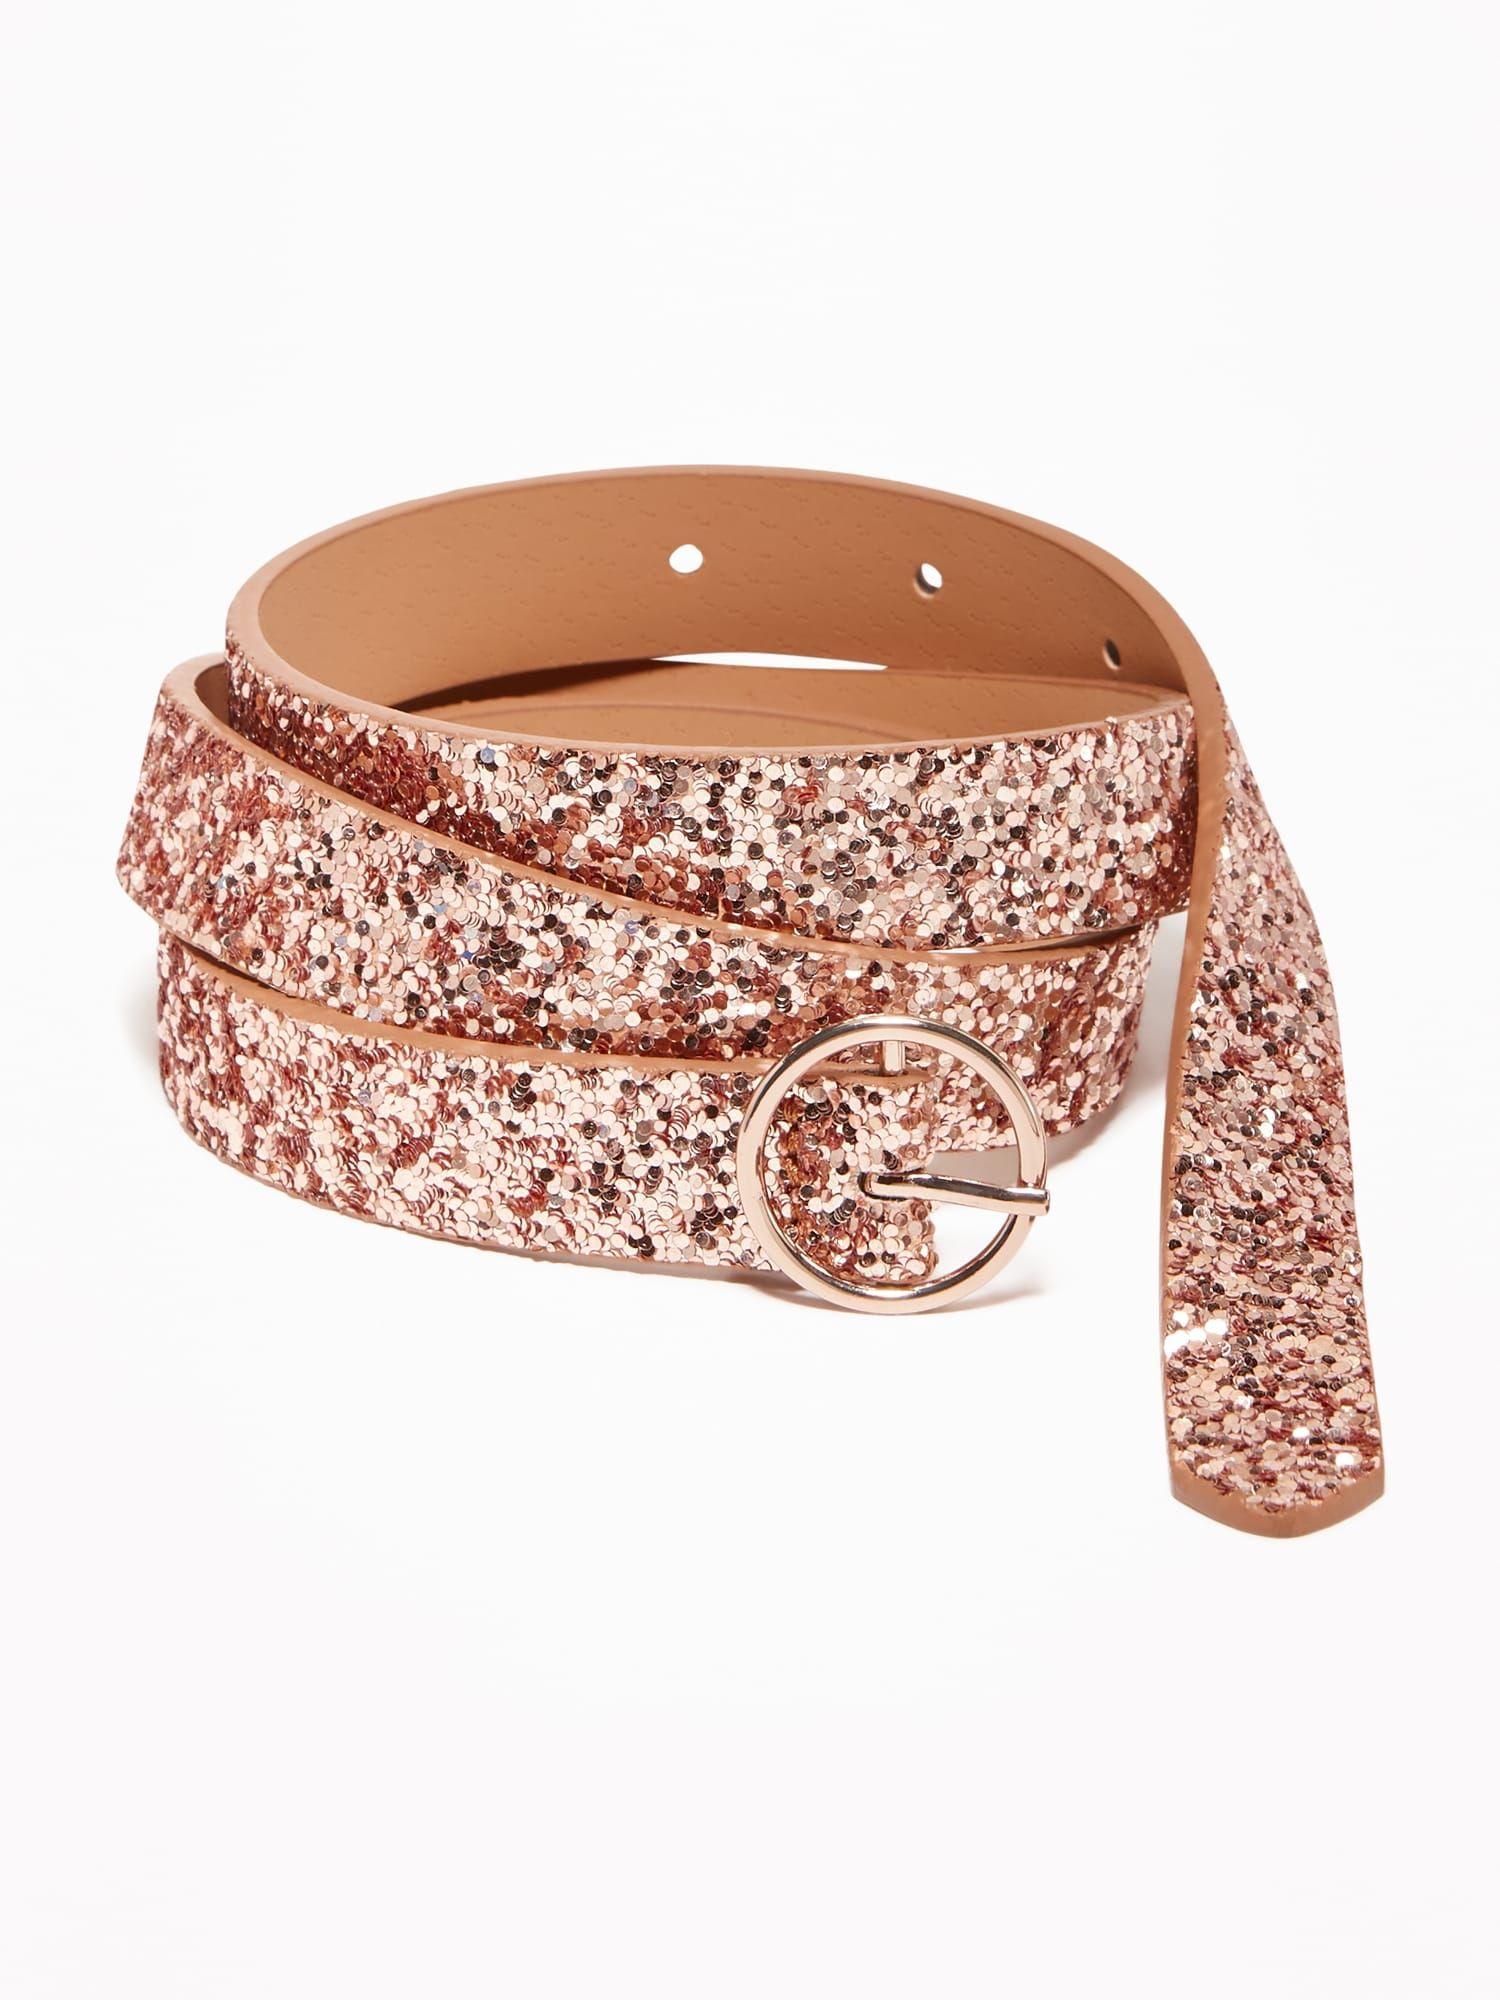 ccde195bf Skinny Glitter O-Ring Belt for Women | Old Navy | Belts in 2019 ...